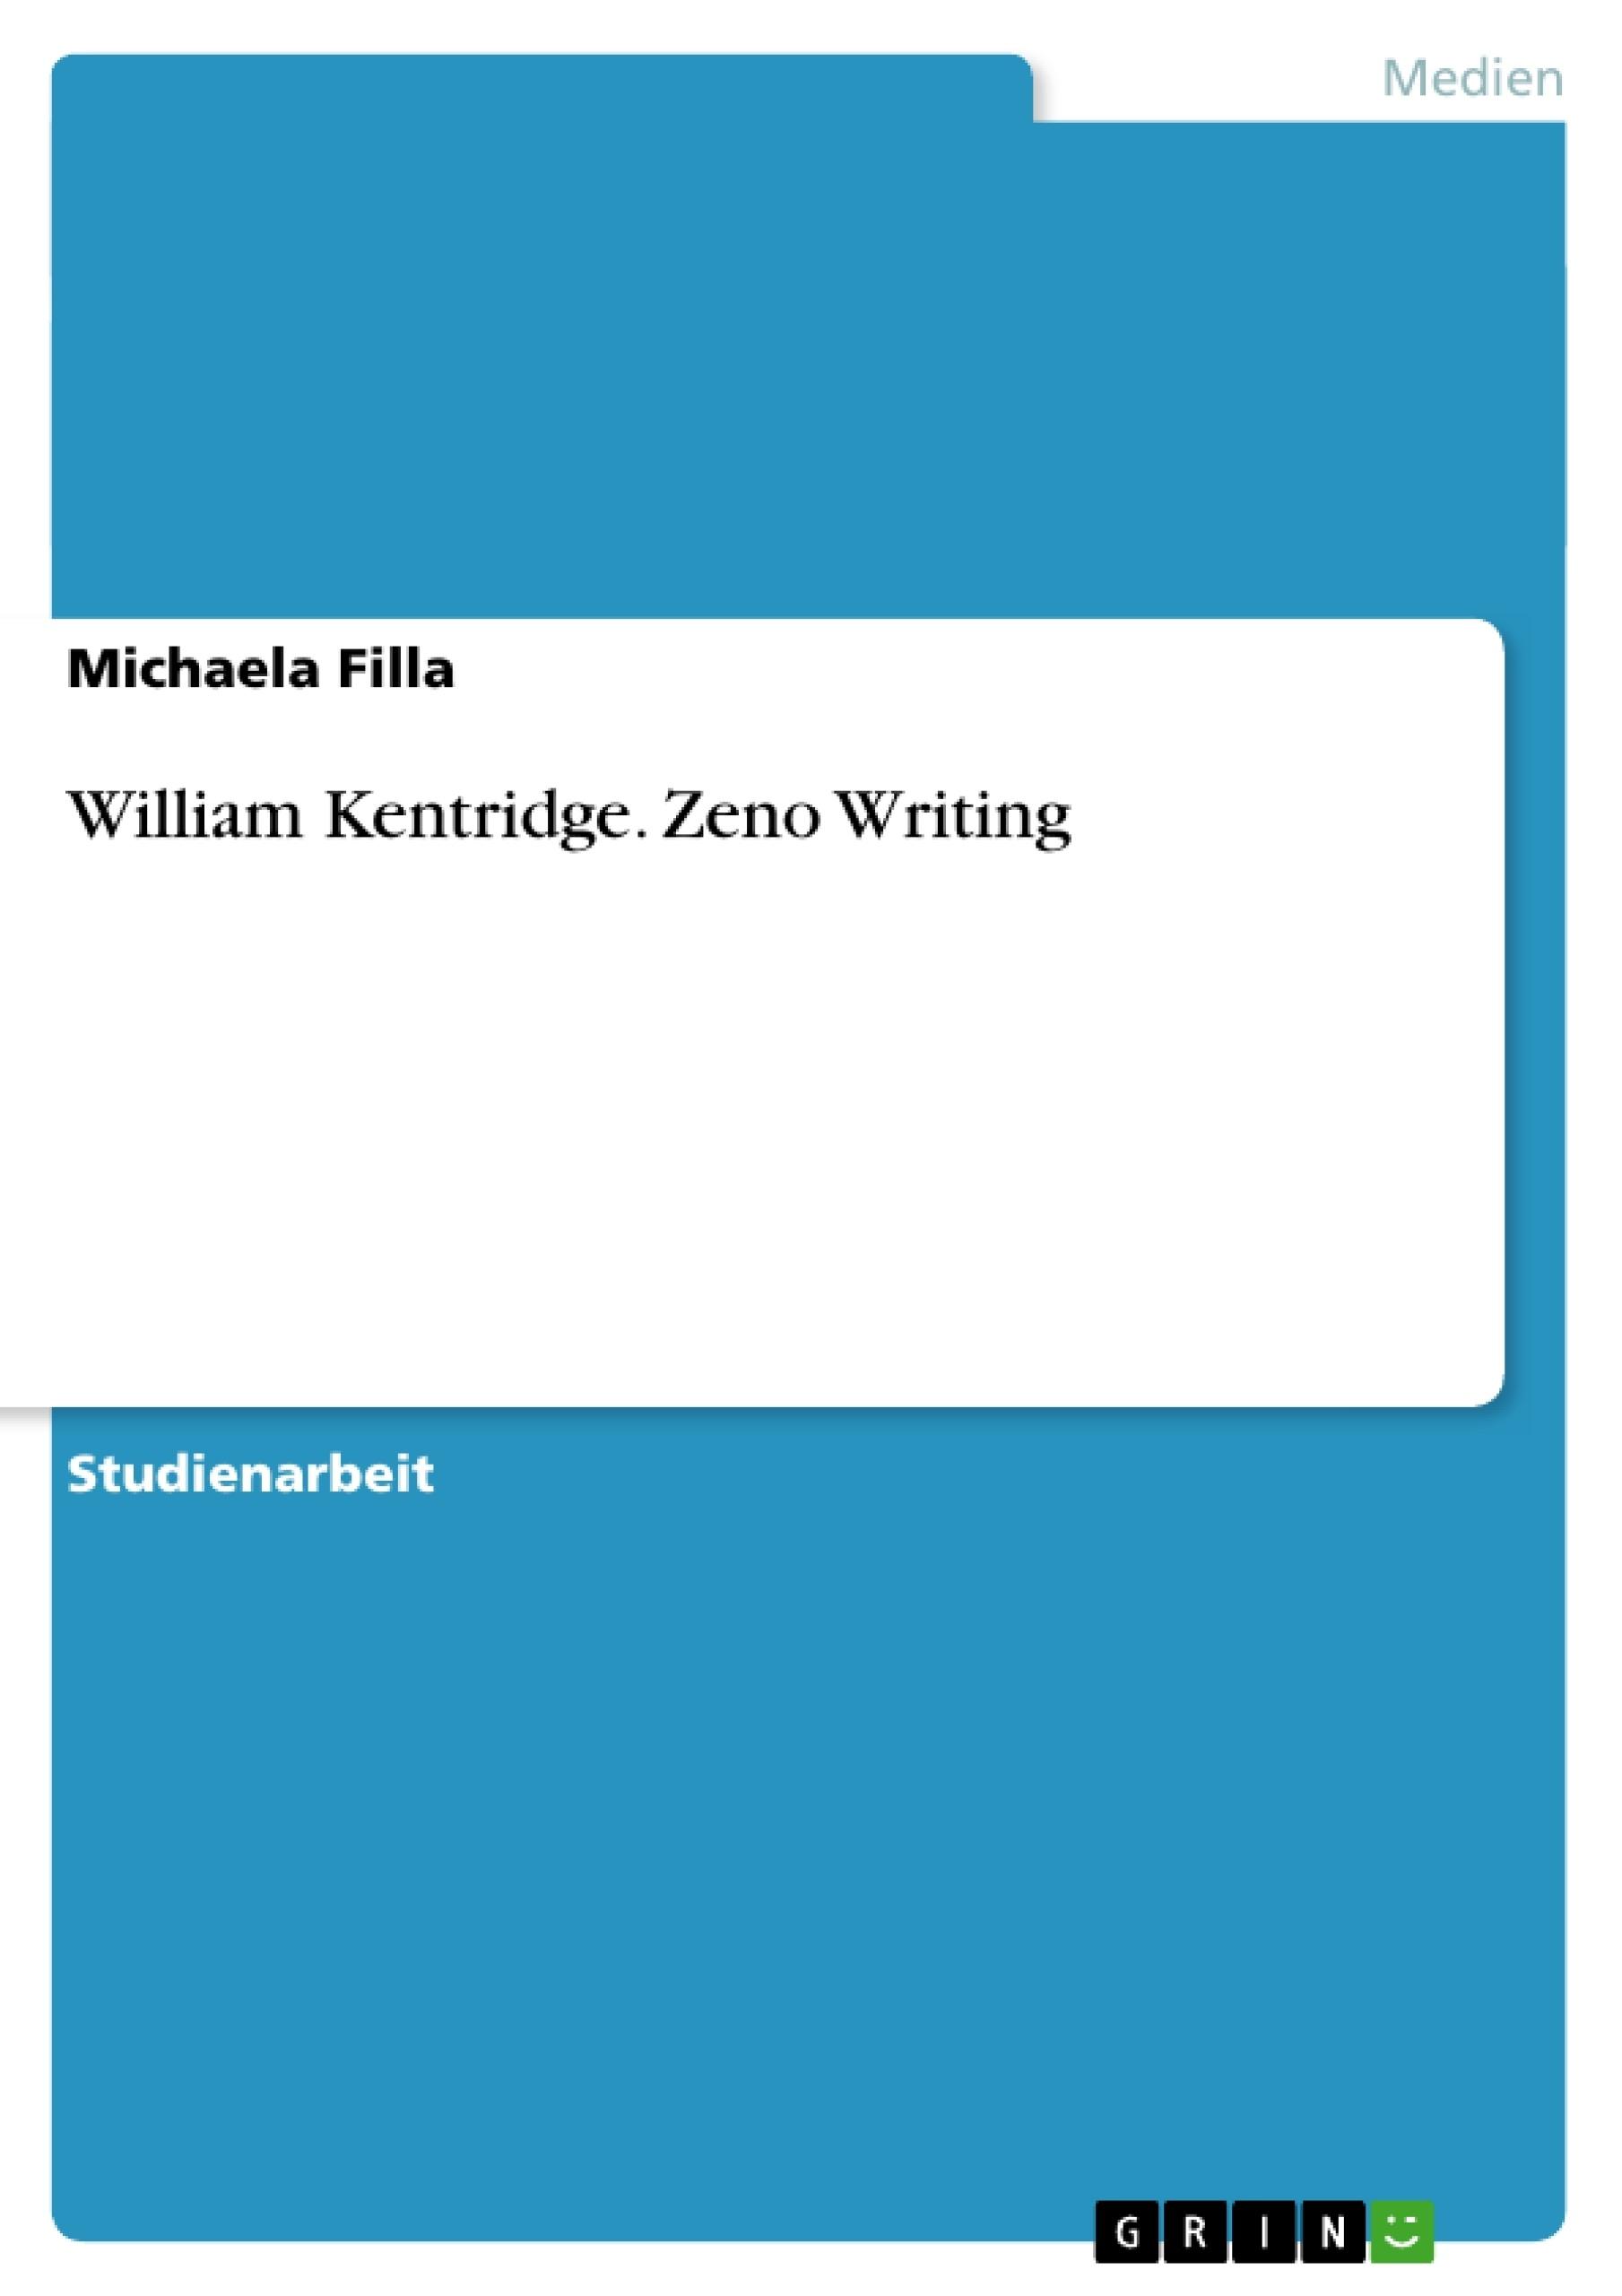 Titel: William Kentridge. Zeno Writing